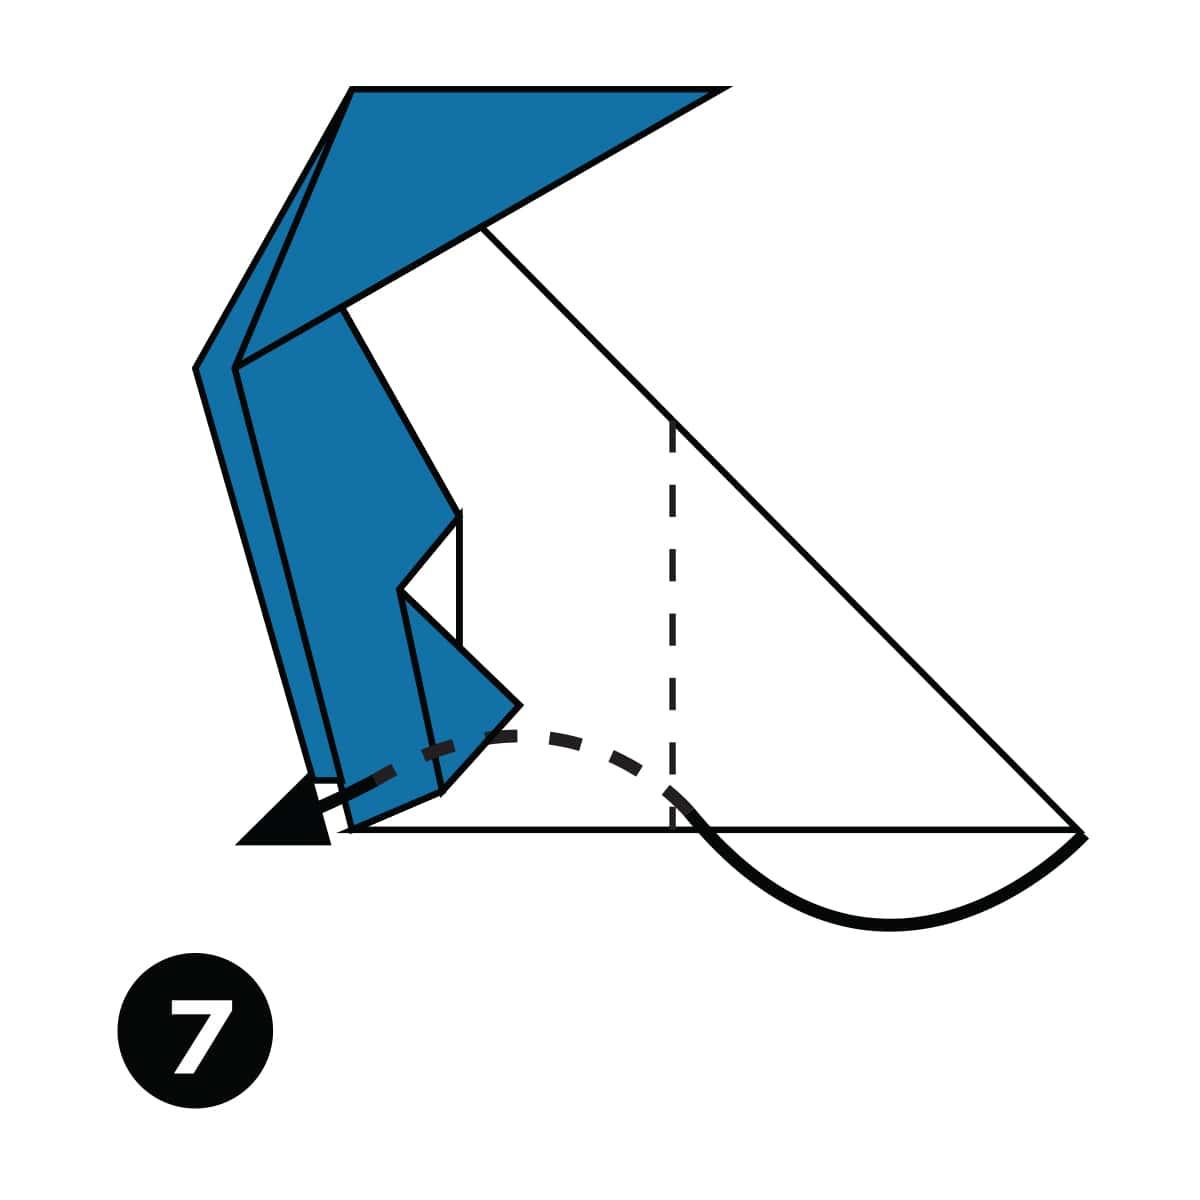 Penguin Step 7